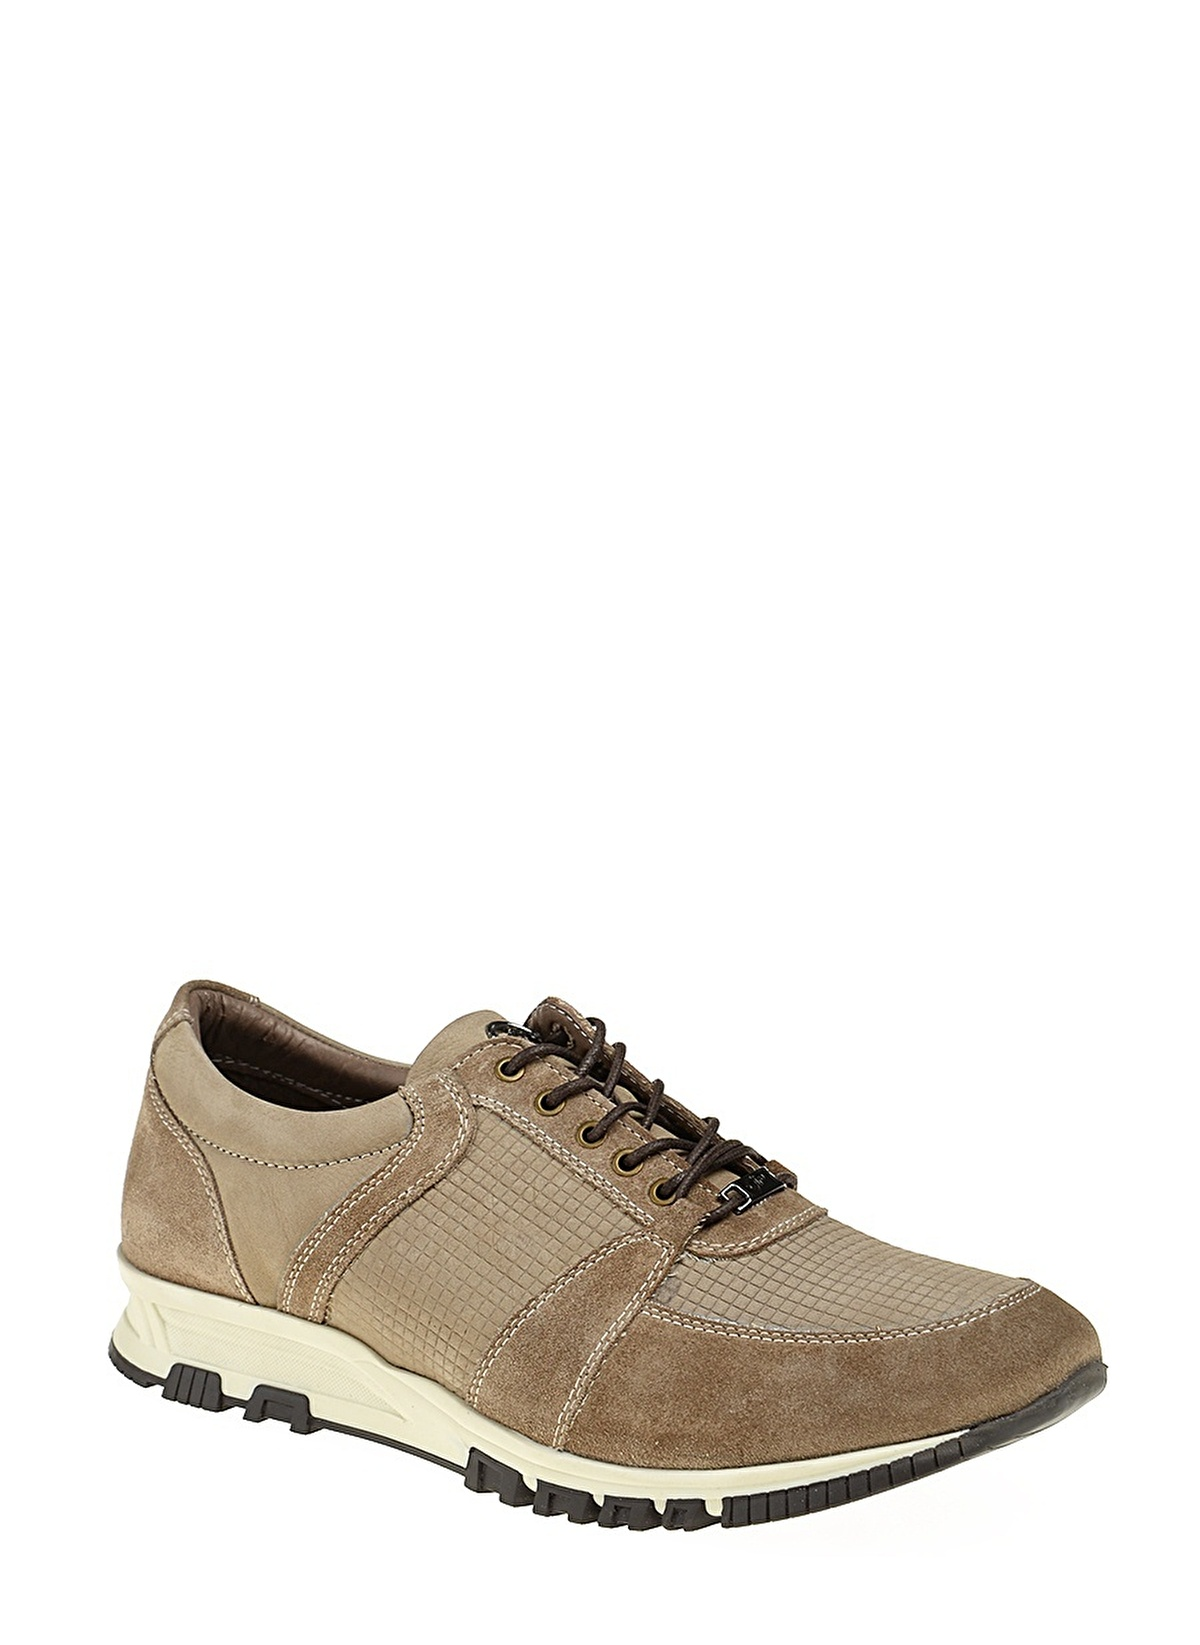 Divarese Lifestyle Ayakkabı 5017490 E Sneaker – 149.0 TL